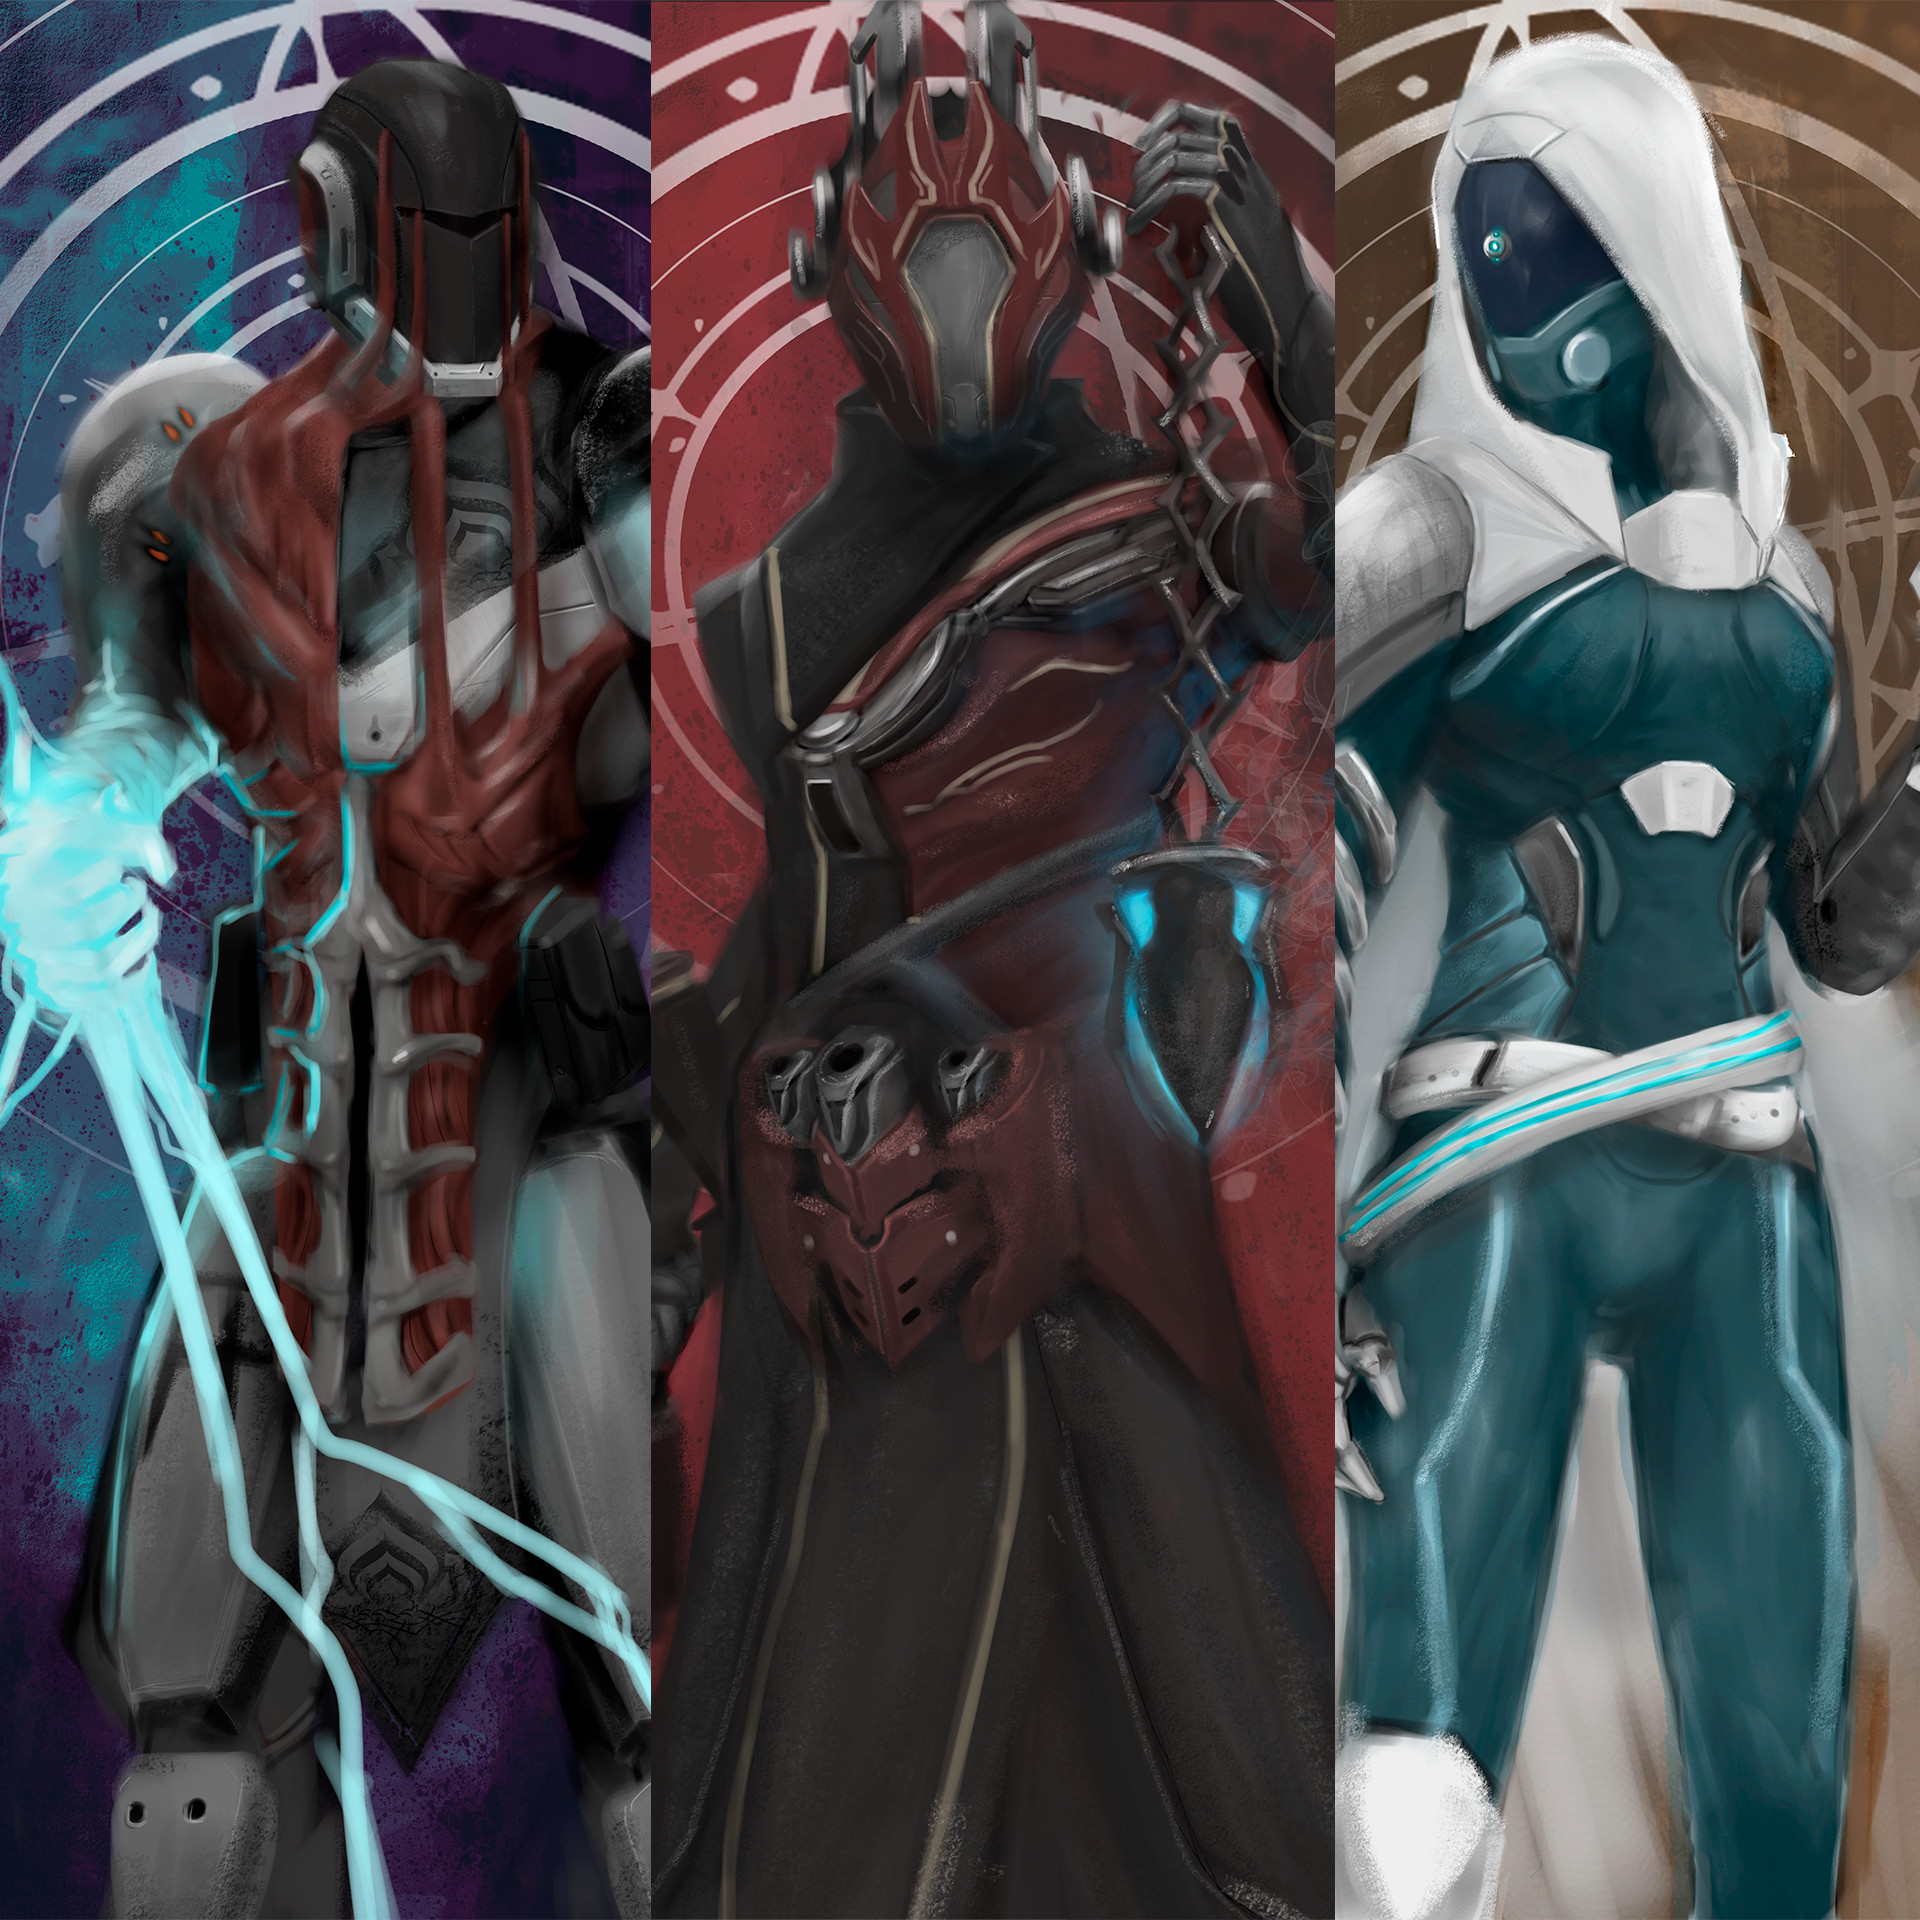 ArtStation - Warframe x Destiny , Enrique Shieh